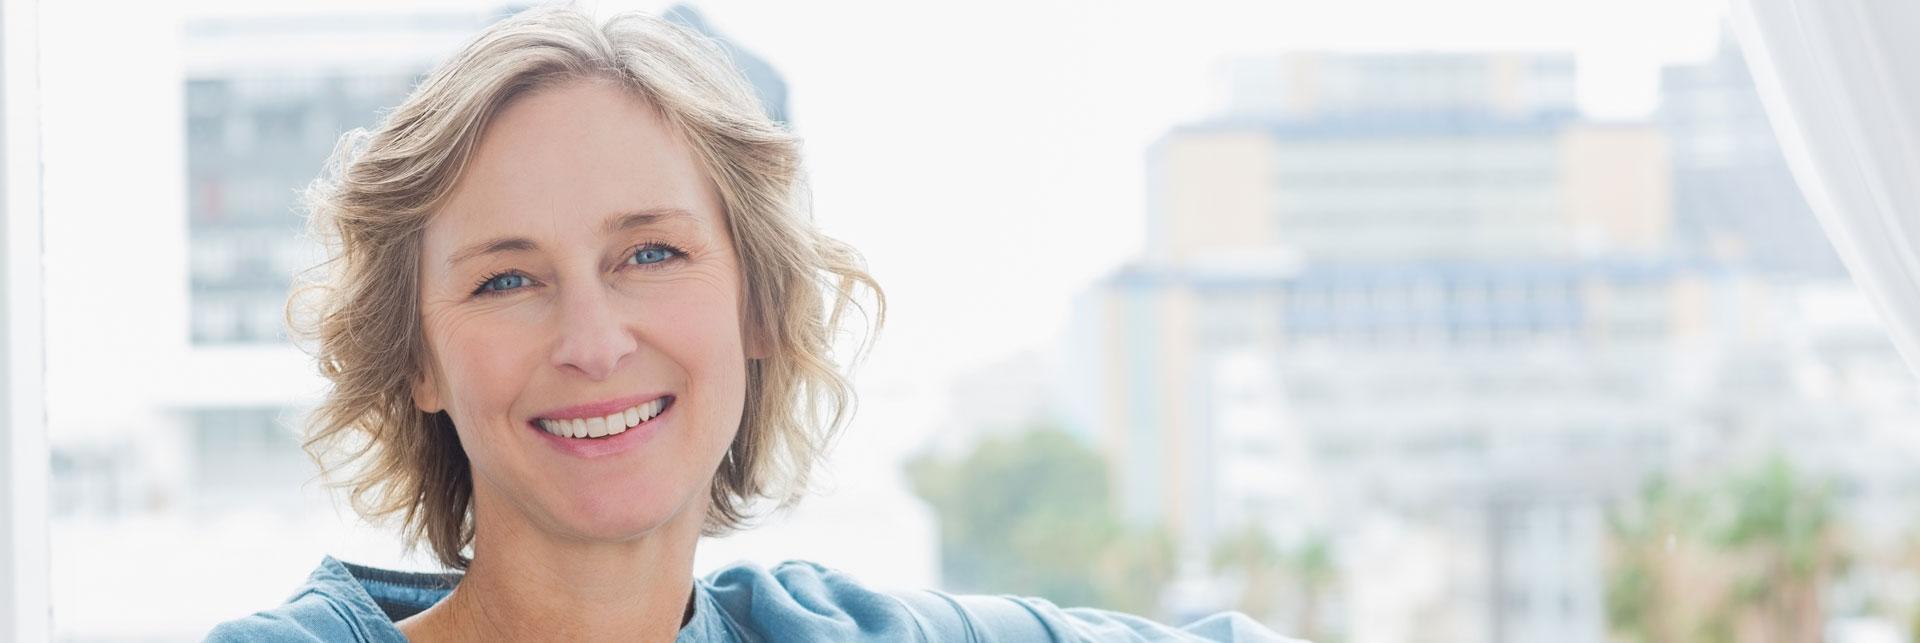 Happy woman who had a restorative care treatment